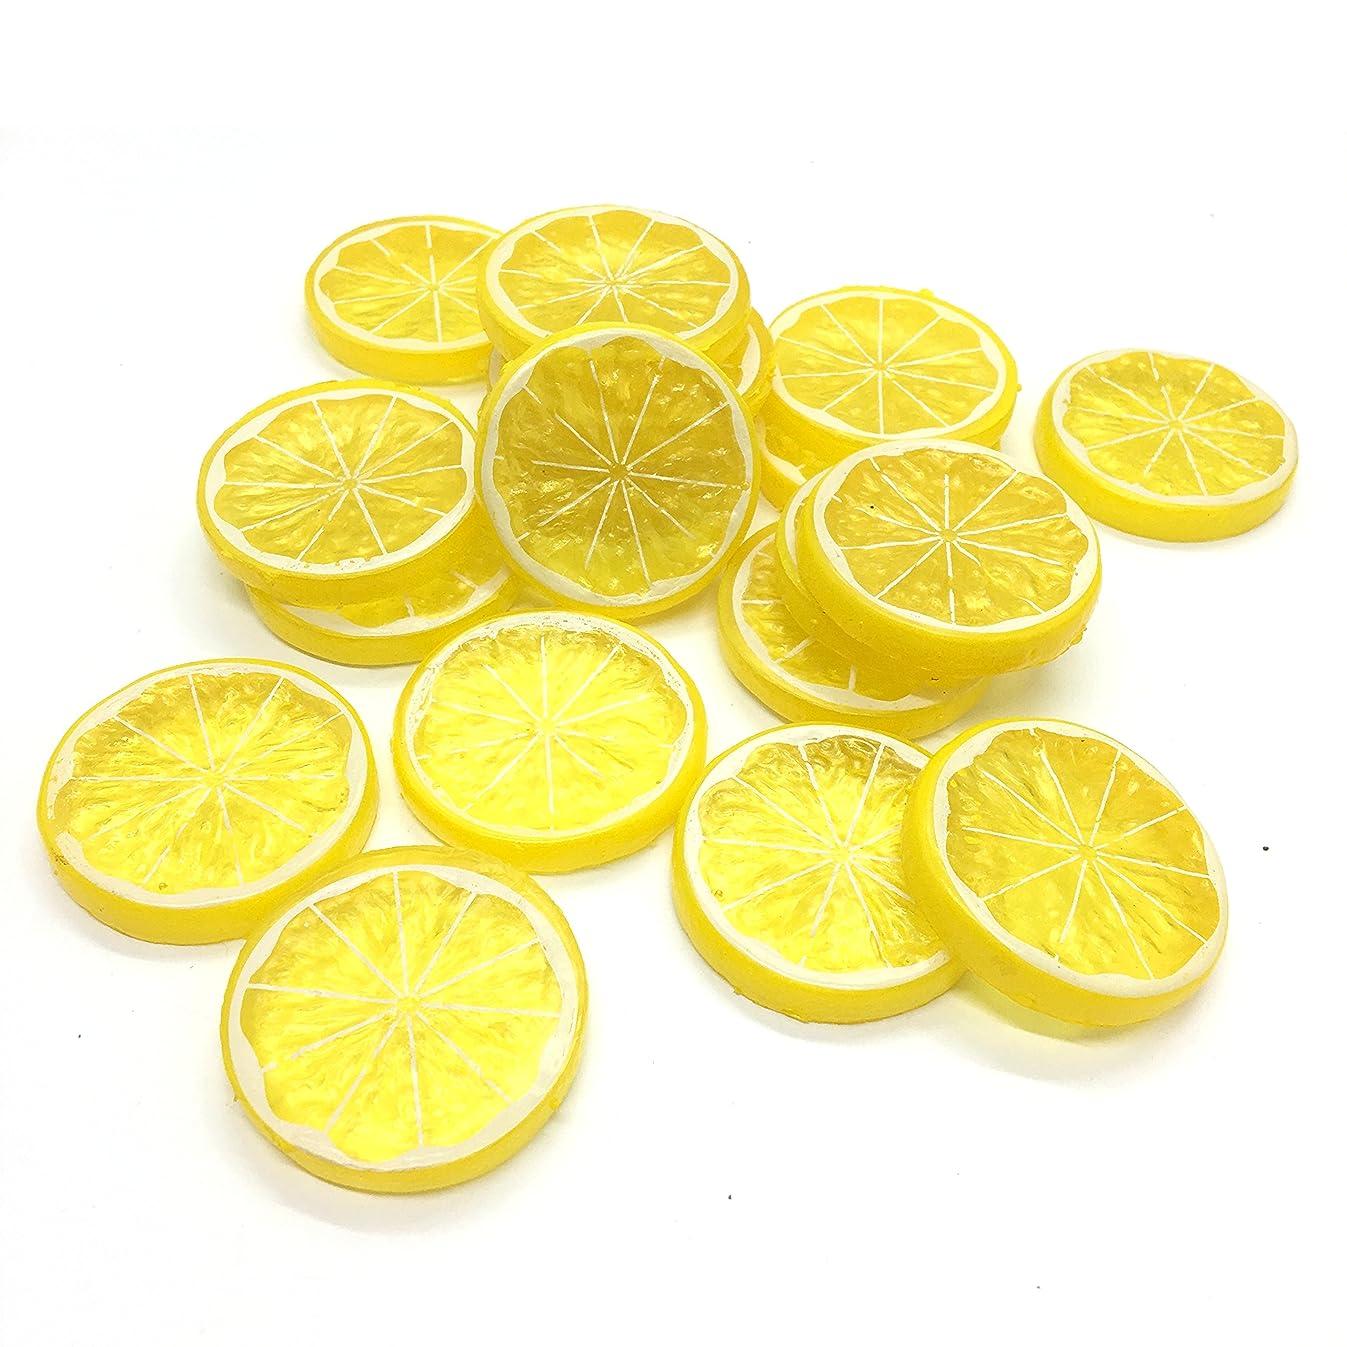 HUELE 20PCS Mini Small Simulation Lemon Slices Plastic Fake Artificial Fruit Model Party Kitchen Wedding Decoration(Yellow)